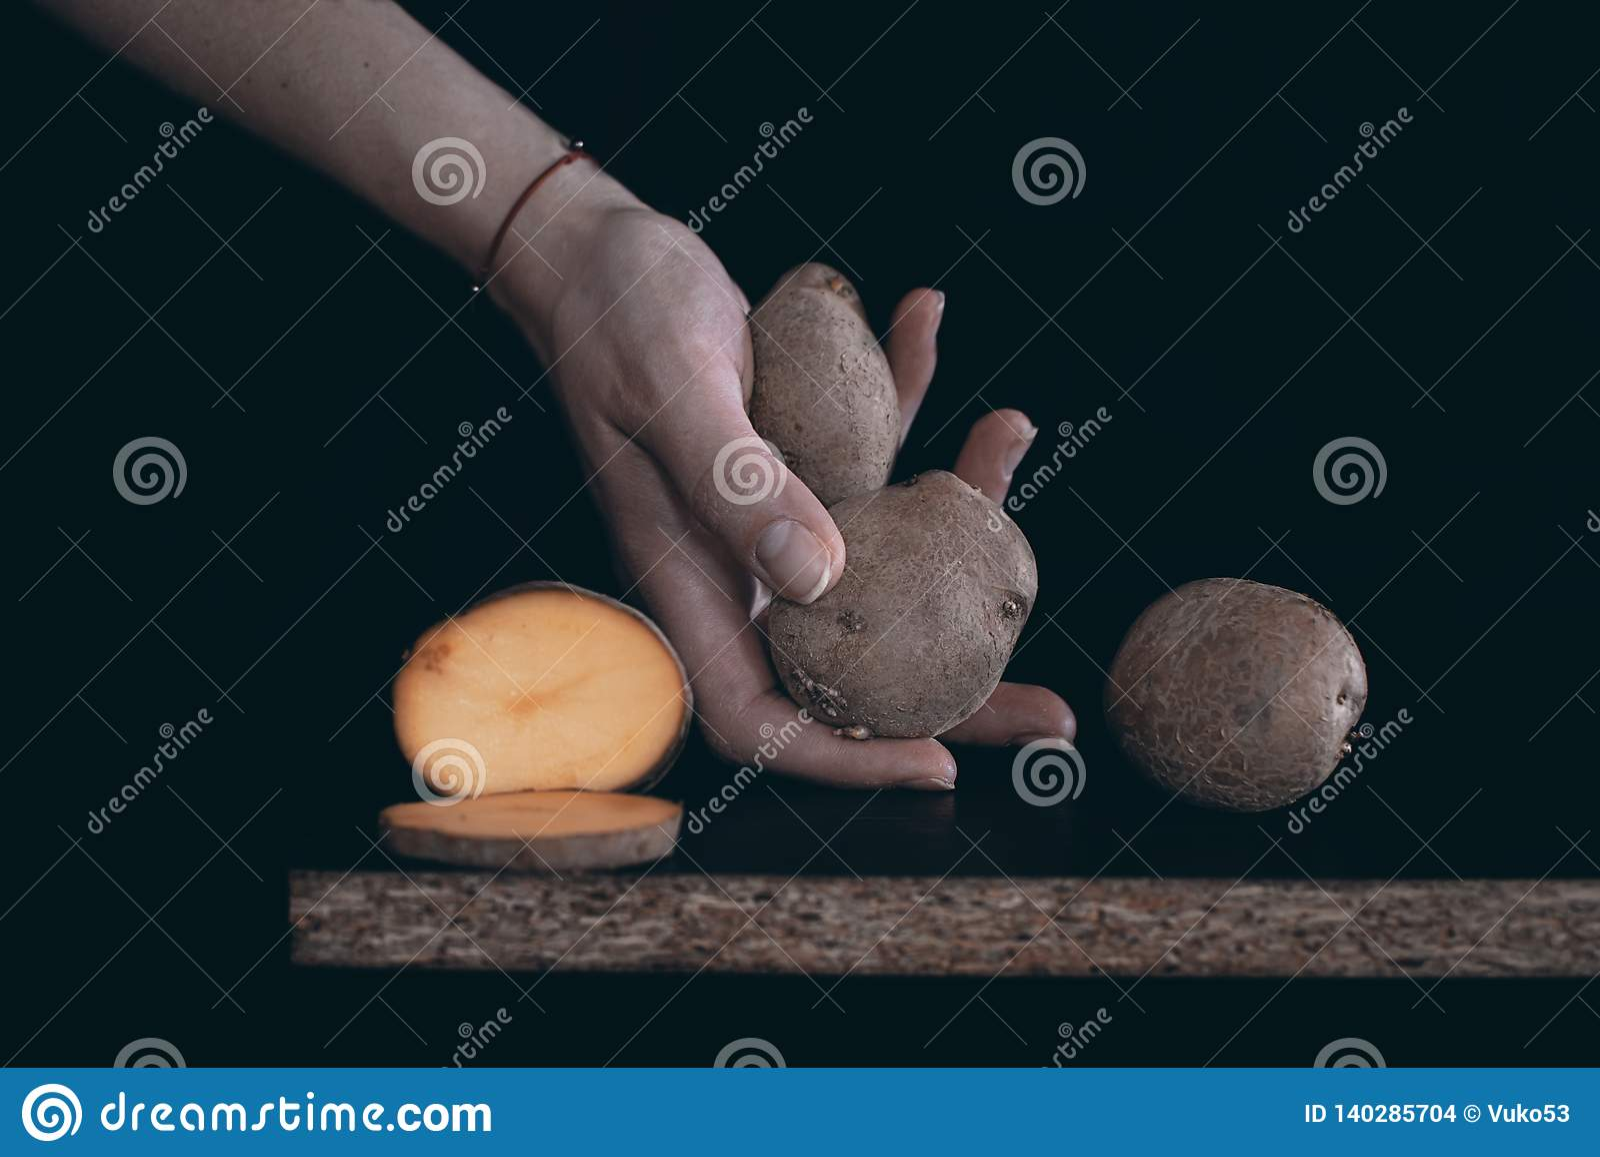 Fresh potatoes in hand